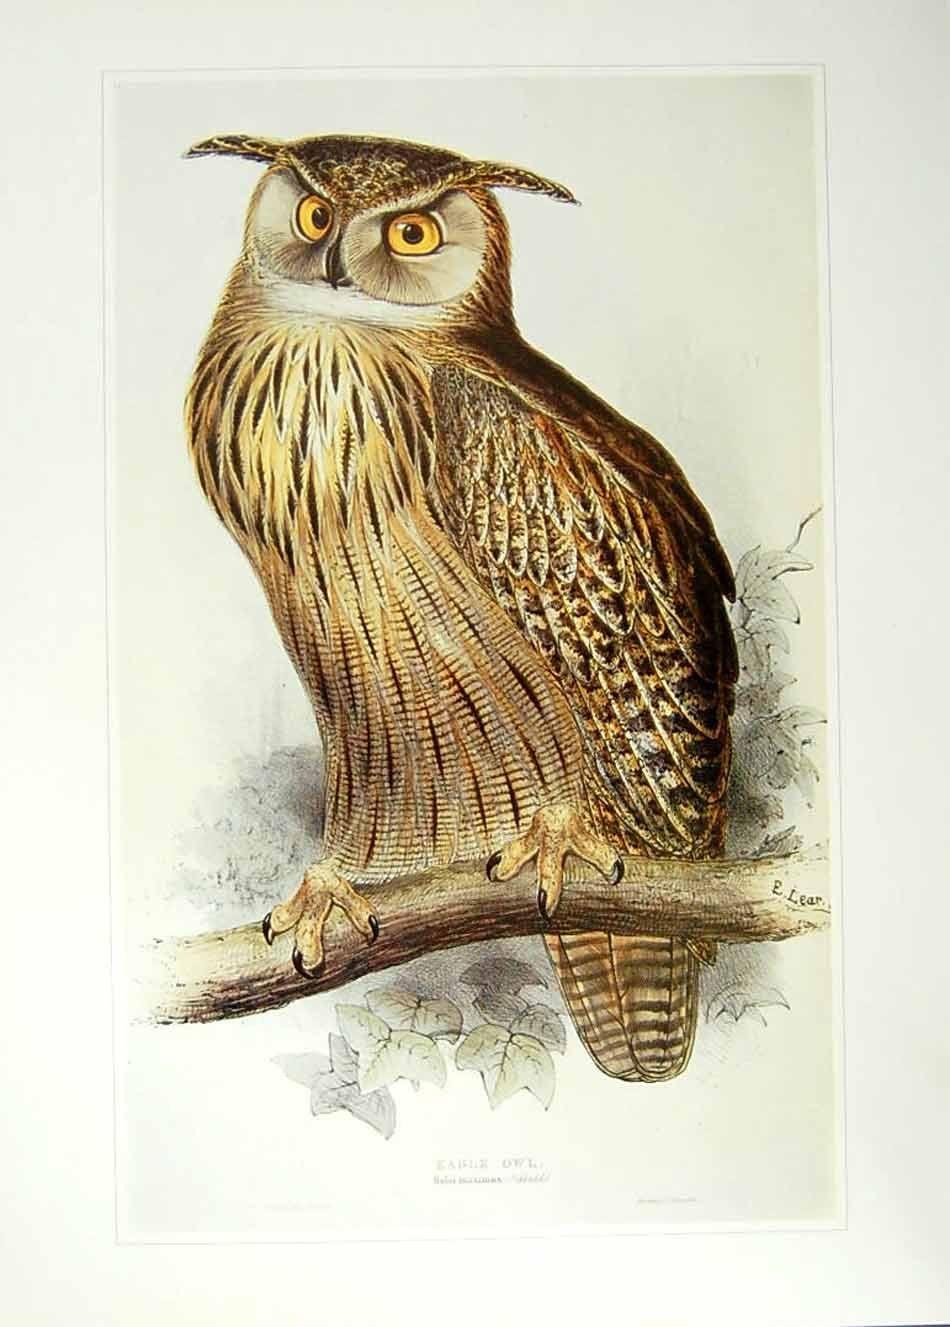 Public Domain Vintage Owl Image 17 Free Vintage Illustrations In 2020 Owl Images Vintage Owl Vintage Illustration